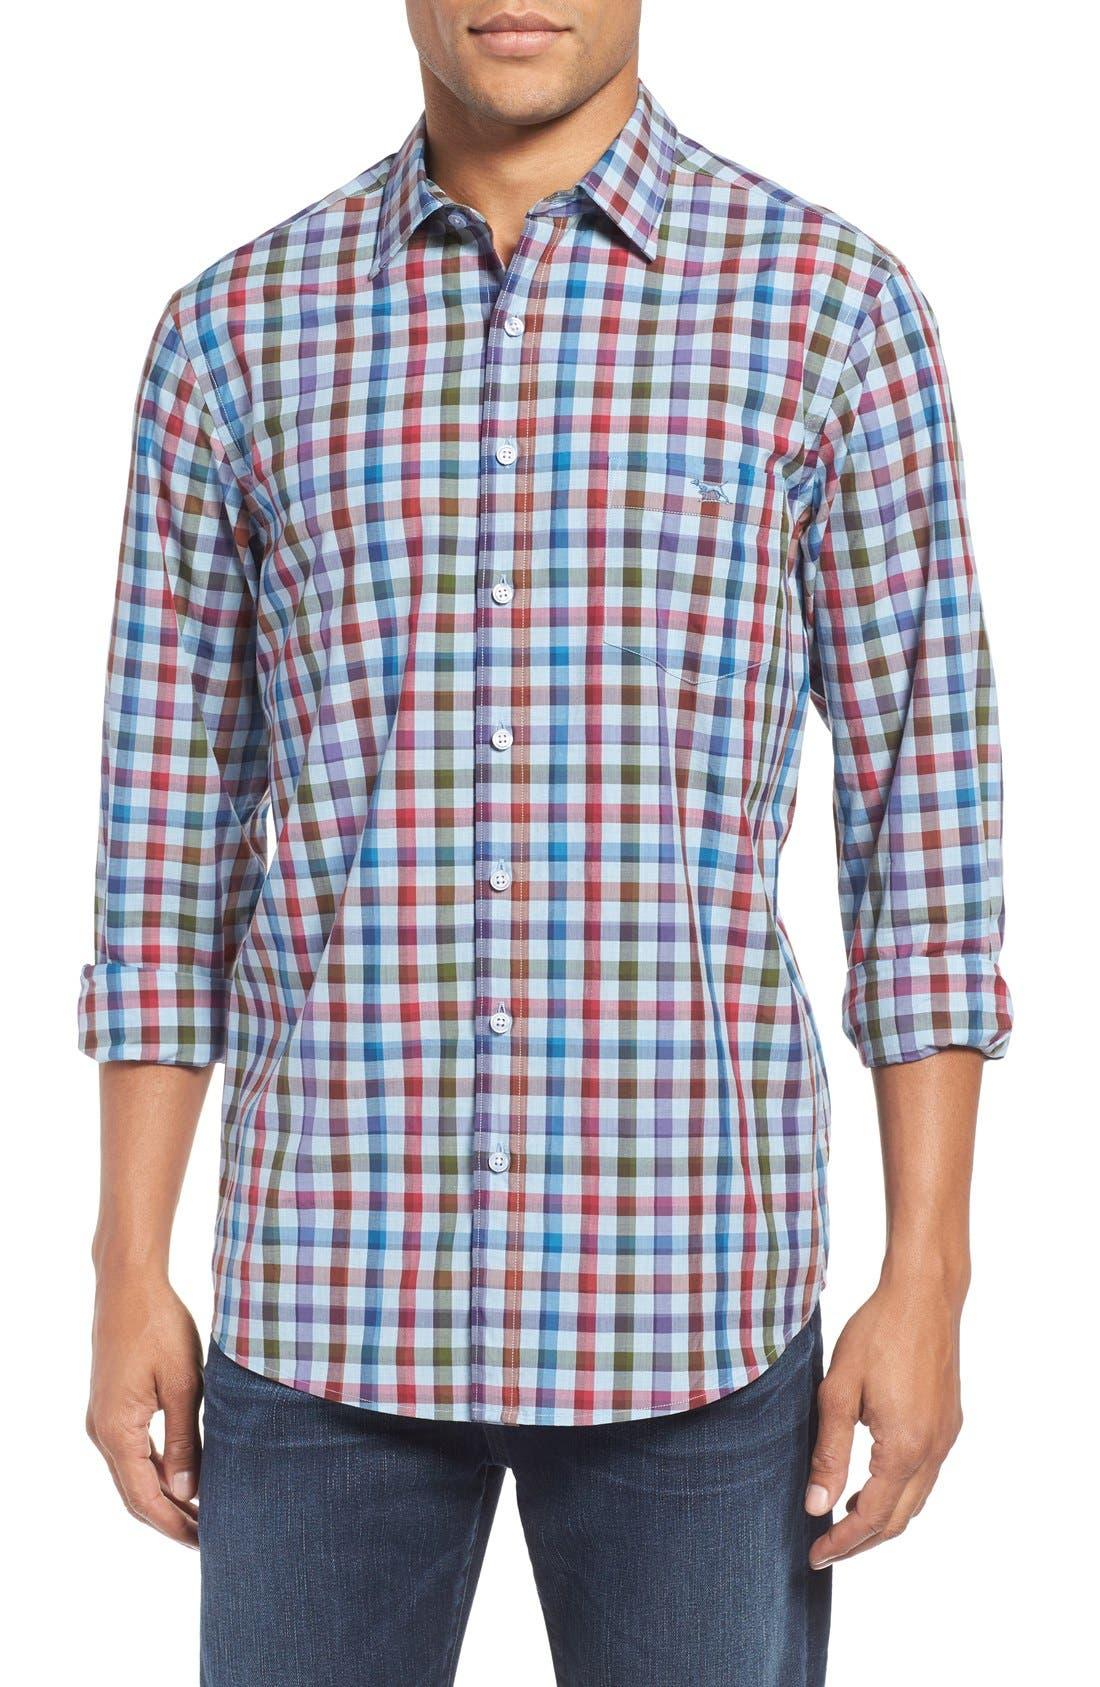 Image of RODD AND GUNN Cedars Long Sleeve Woven Shirt